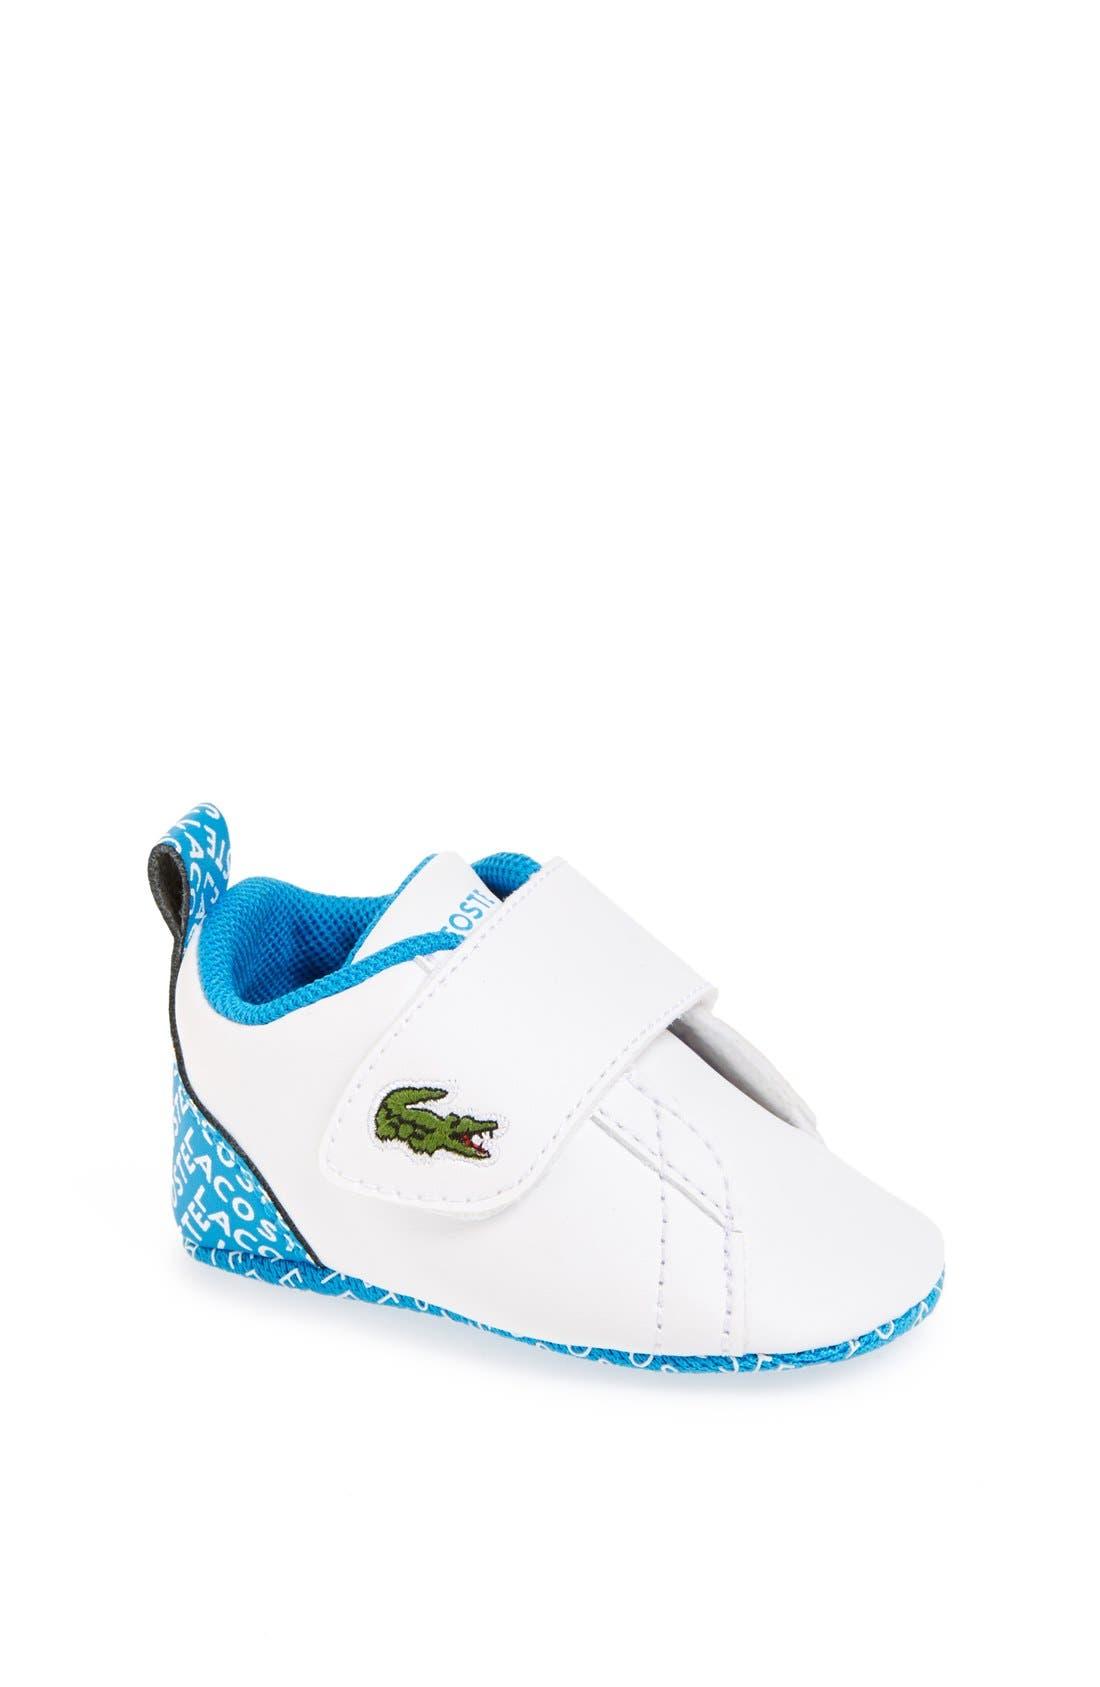 Alternate Image 1 Selected - Lacoste 'Paris Babe' Crib Shoe (Baby)